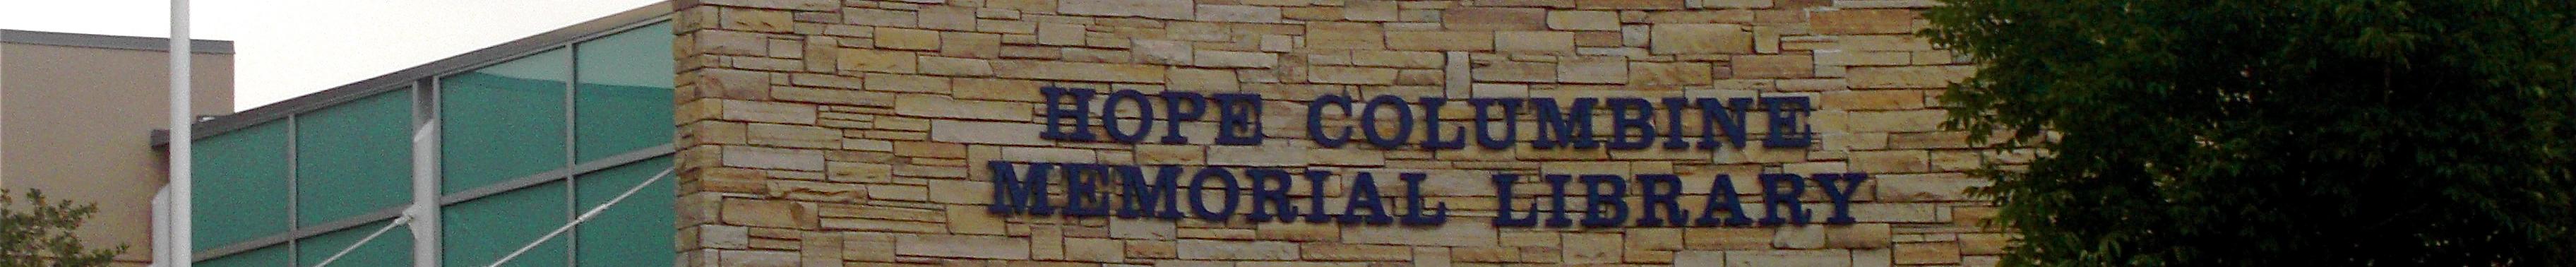 Hope_Columbine_Memorial_Library_thin